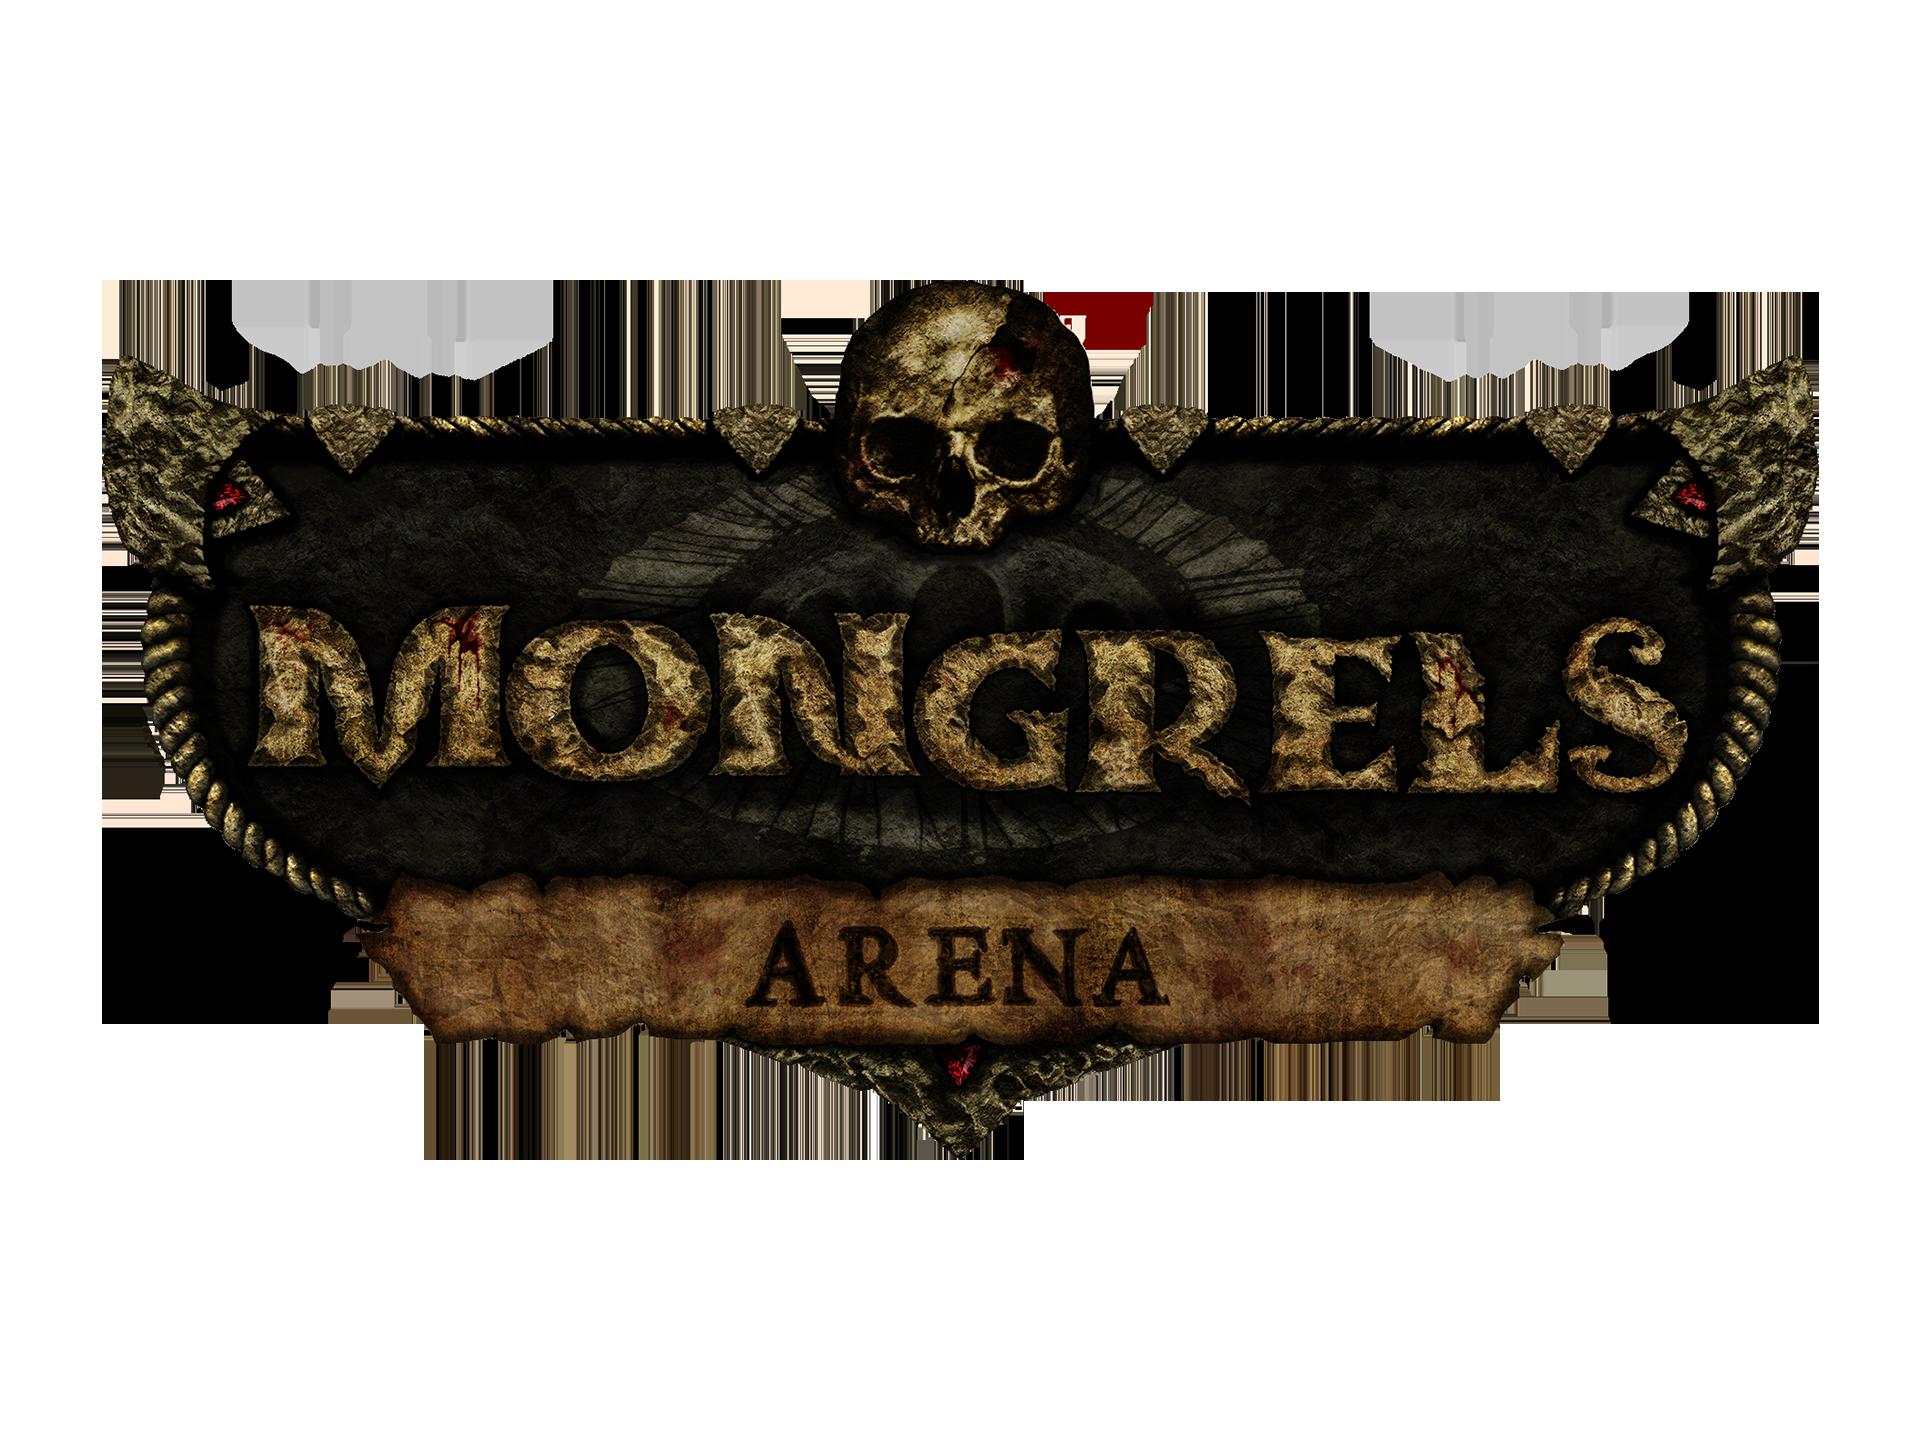 MongrelsArenaLogo1920x1440